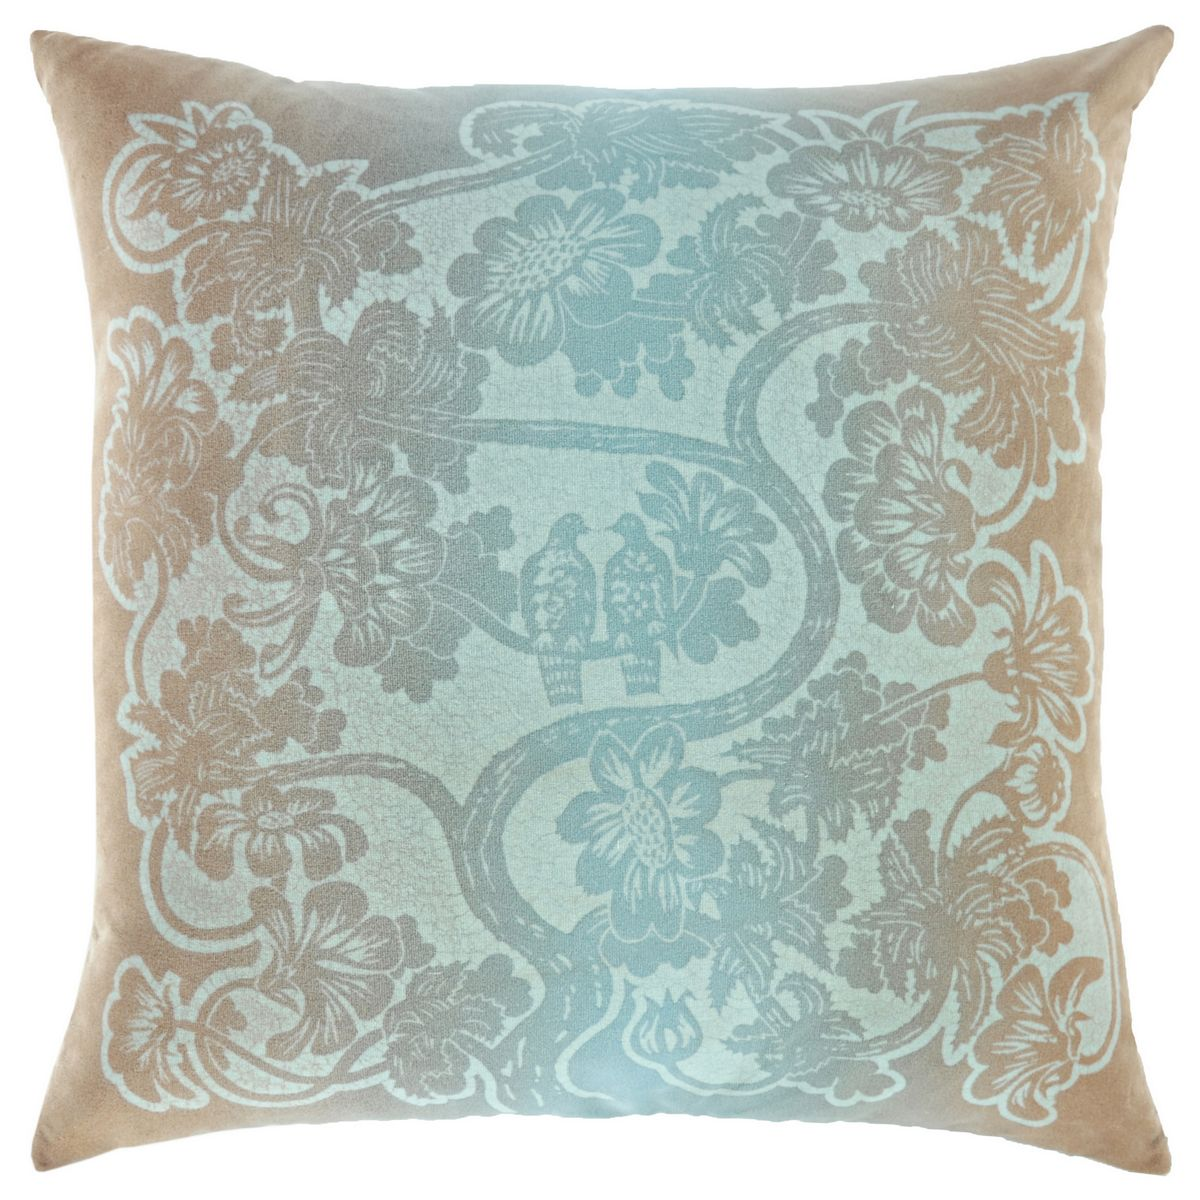 Discontinued Kevin OBrien Studio Lovebirds Glazed Cotton Velvet Dec Pillow